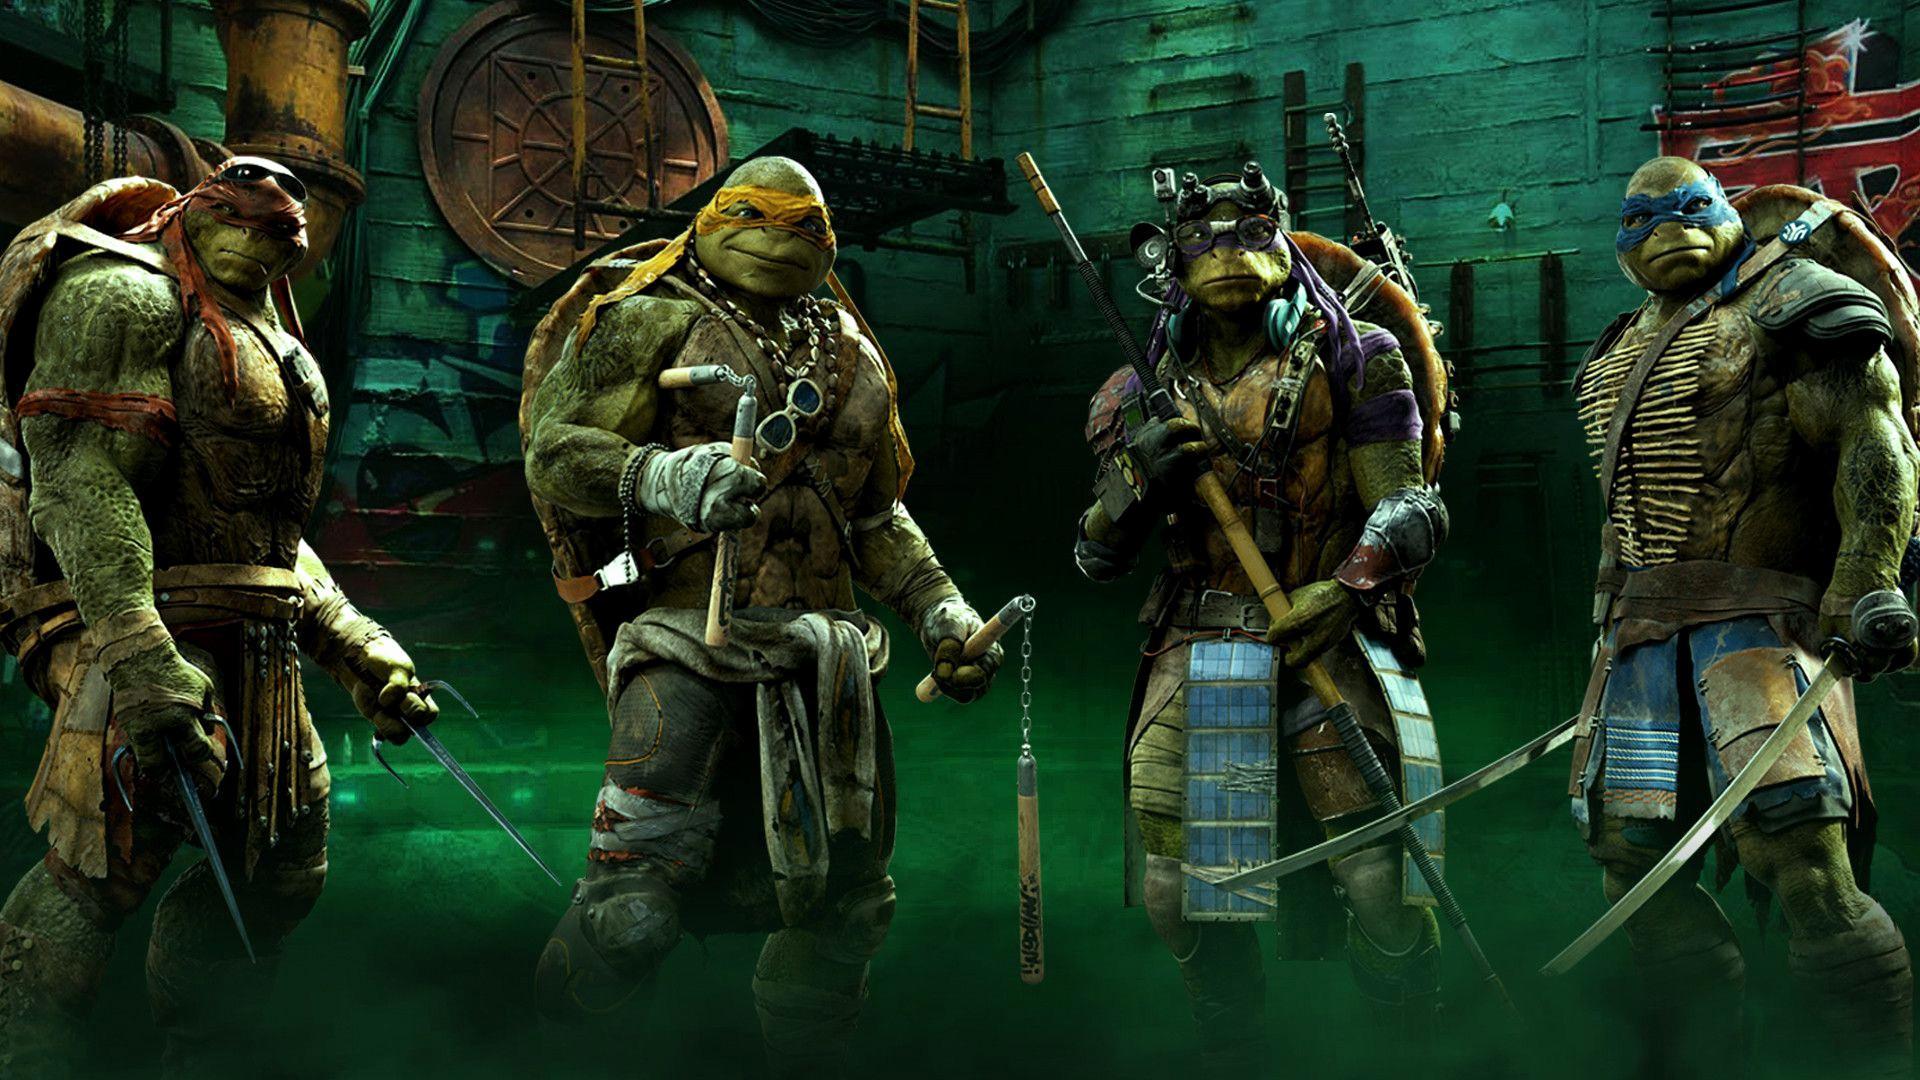 Res: 1920x1080, Ninja Turtle Wallpaper Elegant Units Of Teenage Mutant Ninja Turtles  Wallpaper 1519—1046 Tmnt